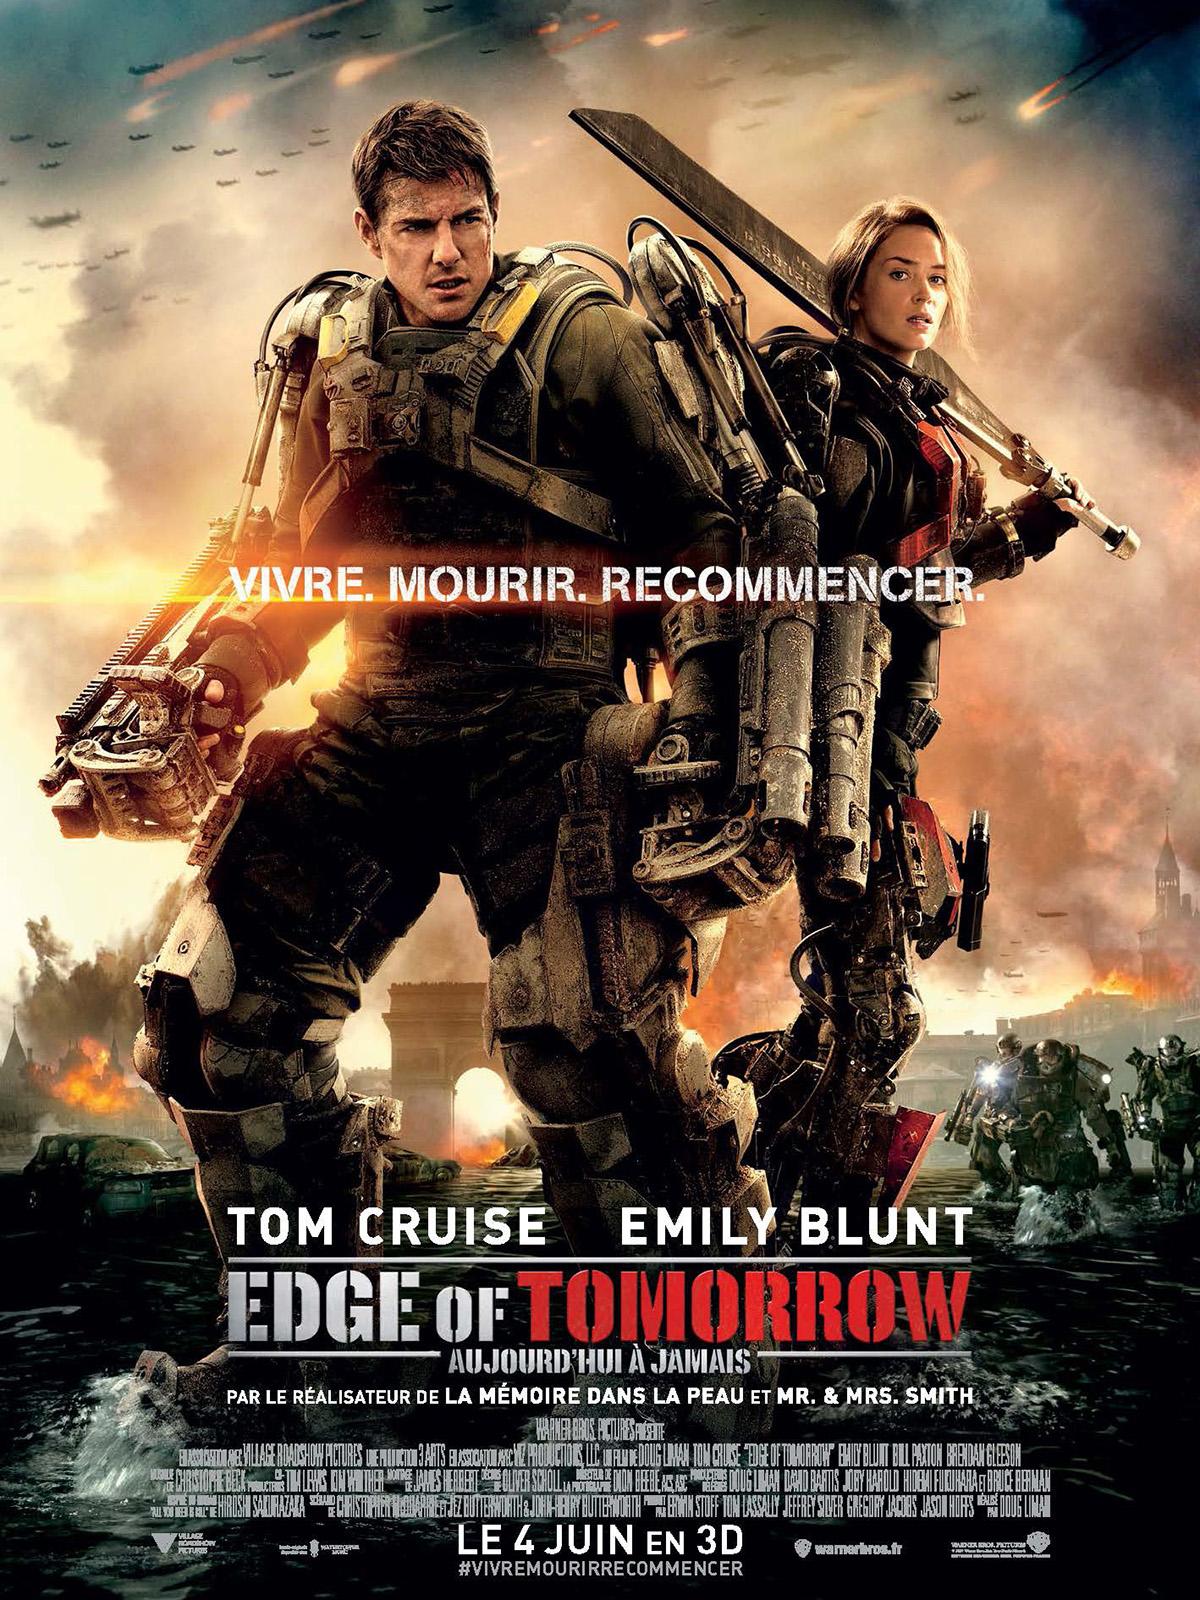 Edge of tomorrow (2014) de Doug Liman